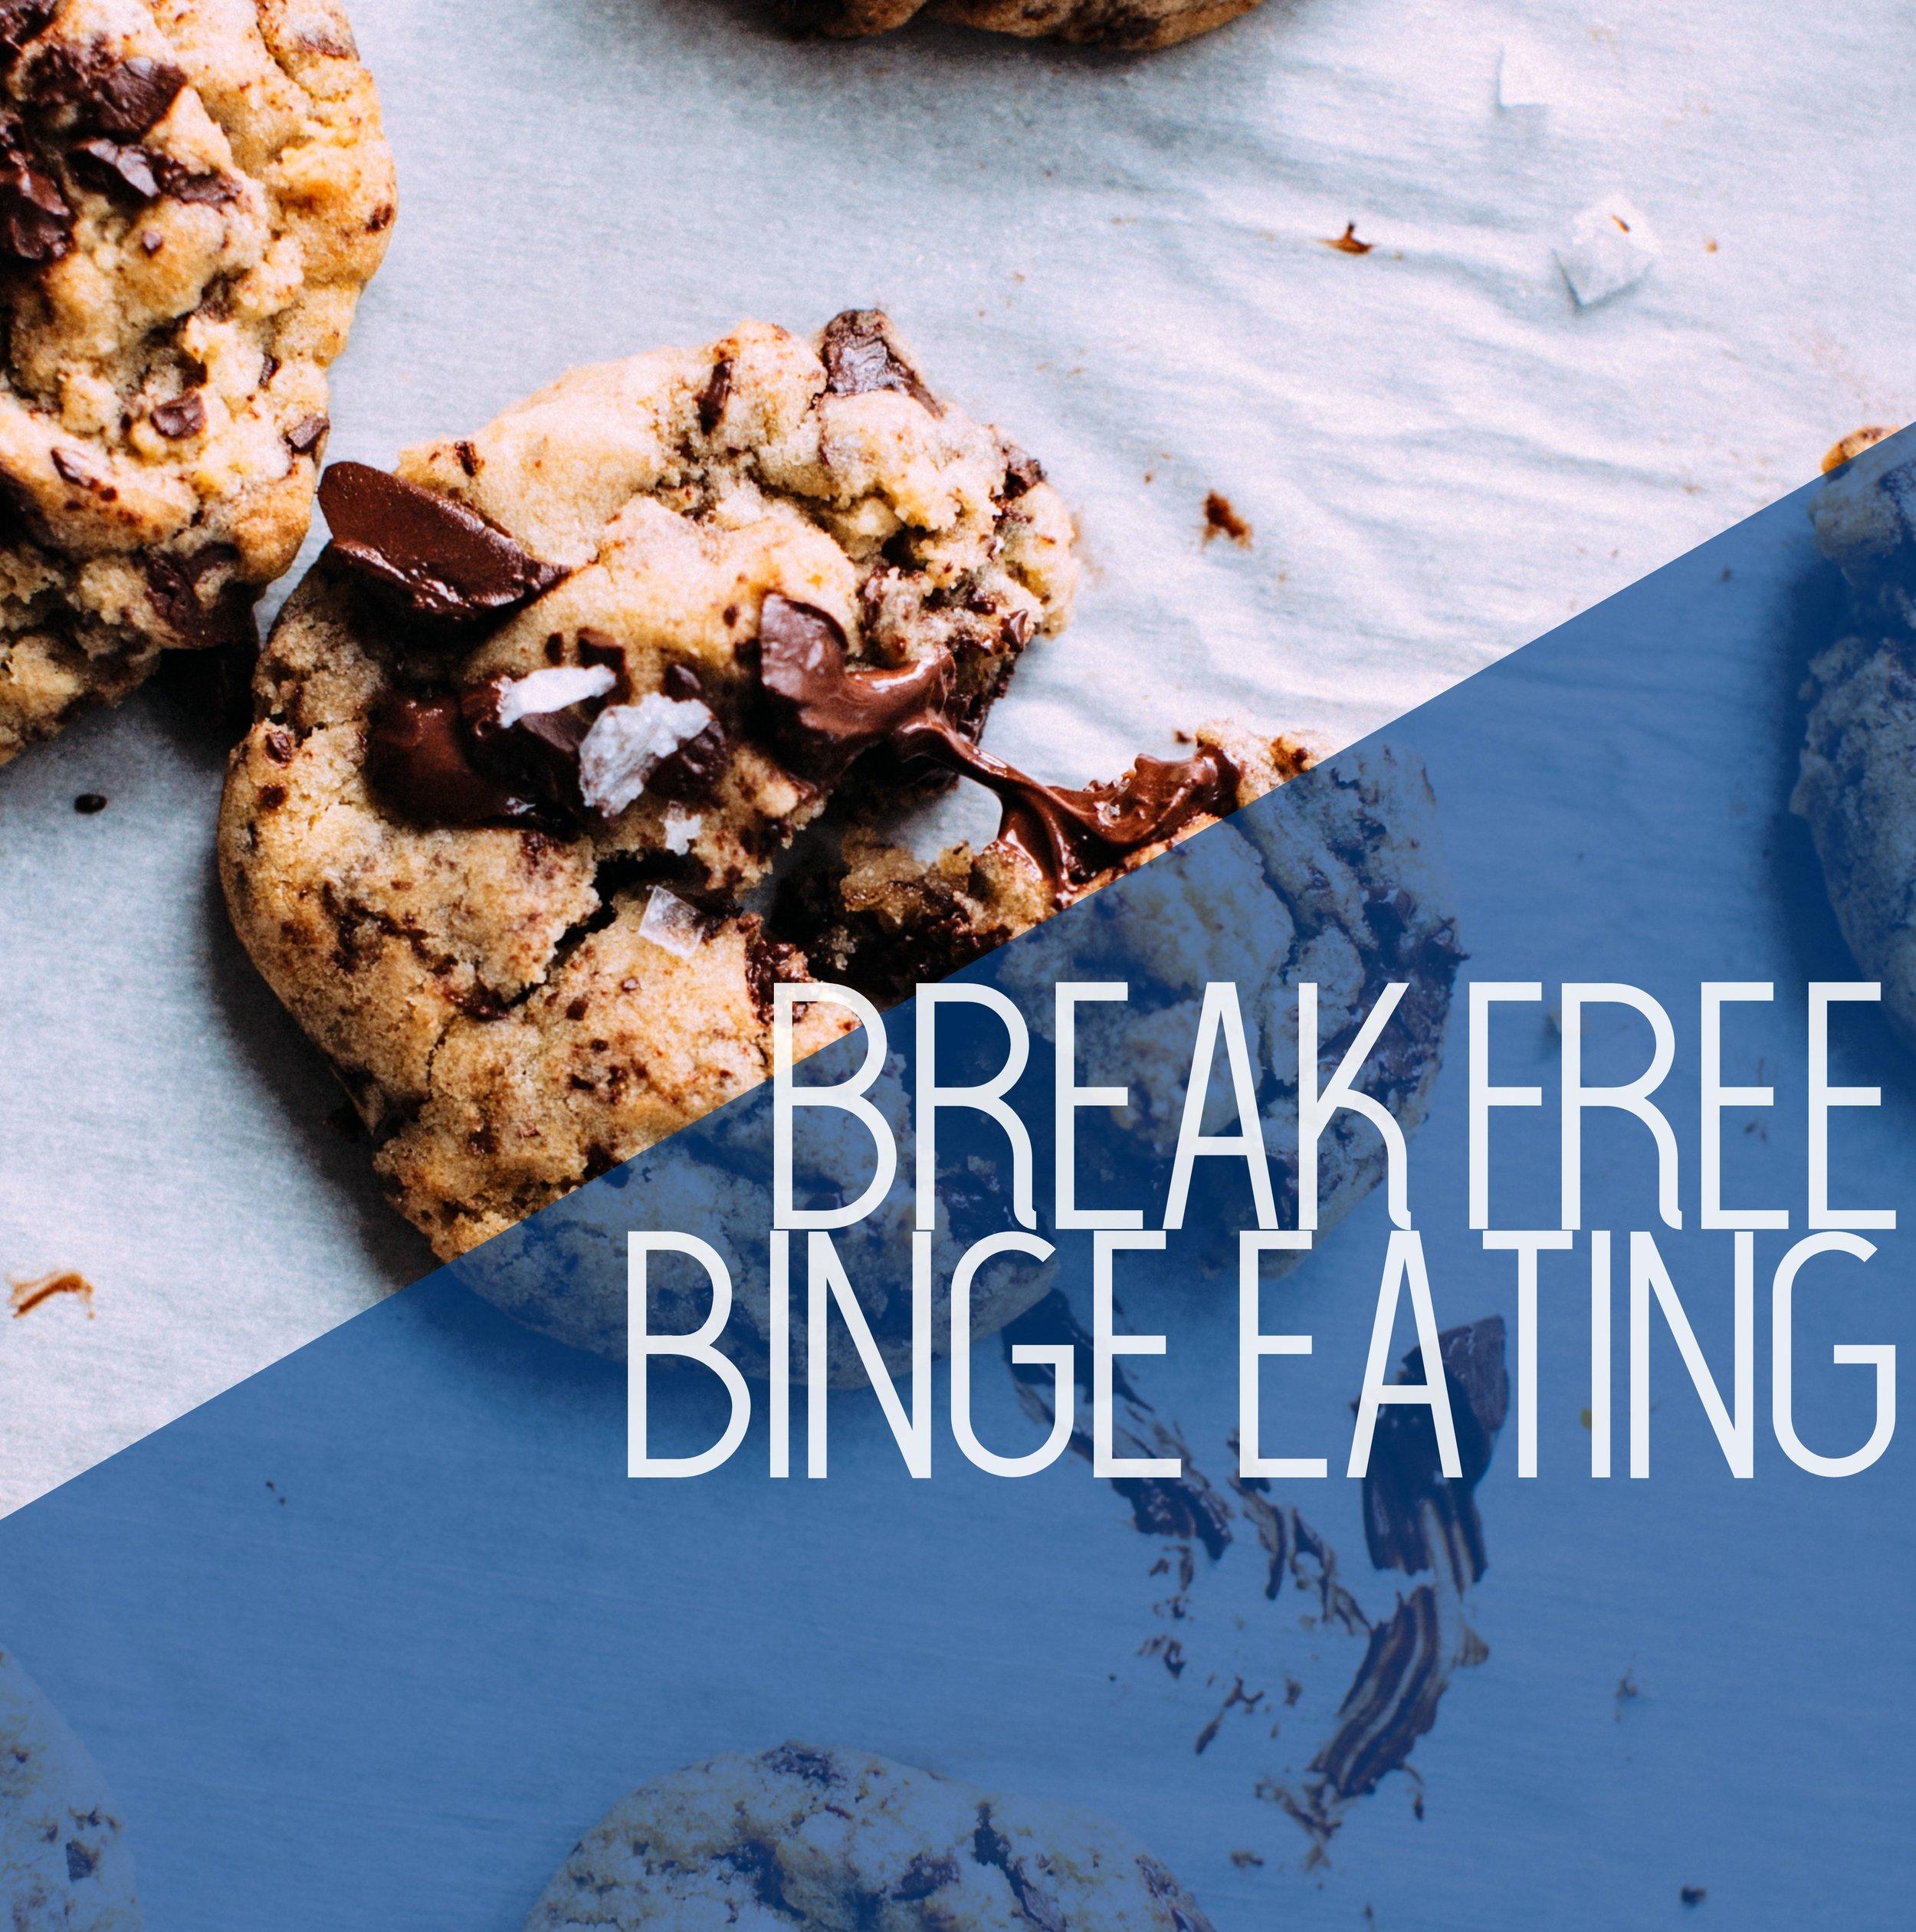 binge eating.jpg